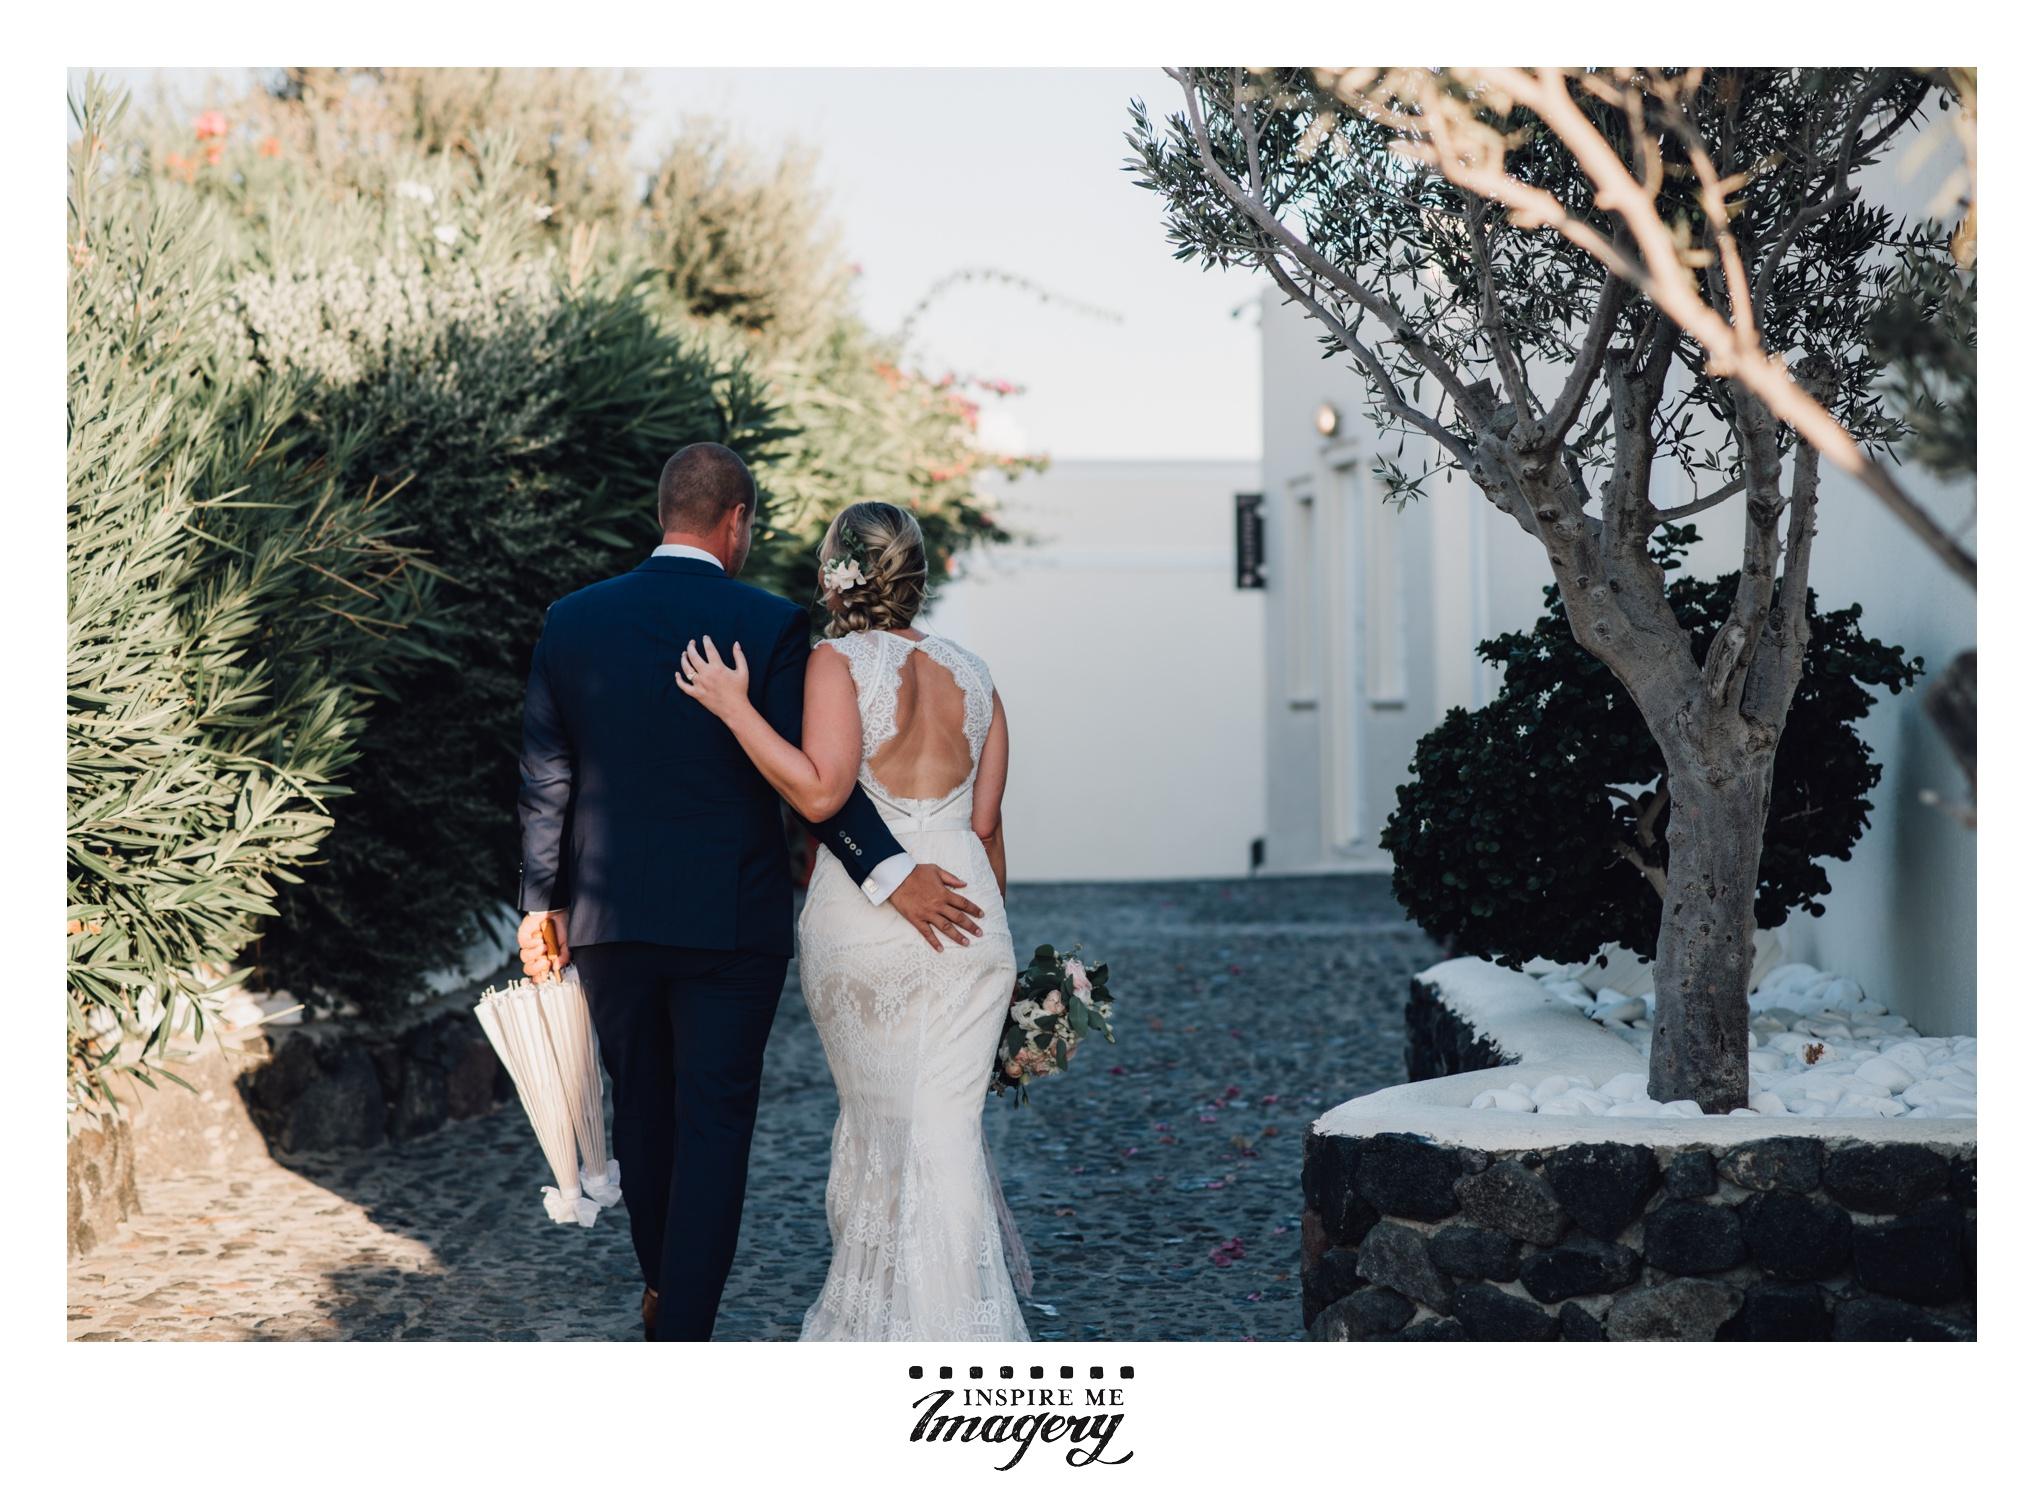 Greece-Santorini-Destination-Wedding-Photography28.jpg